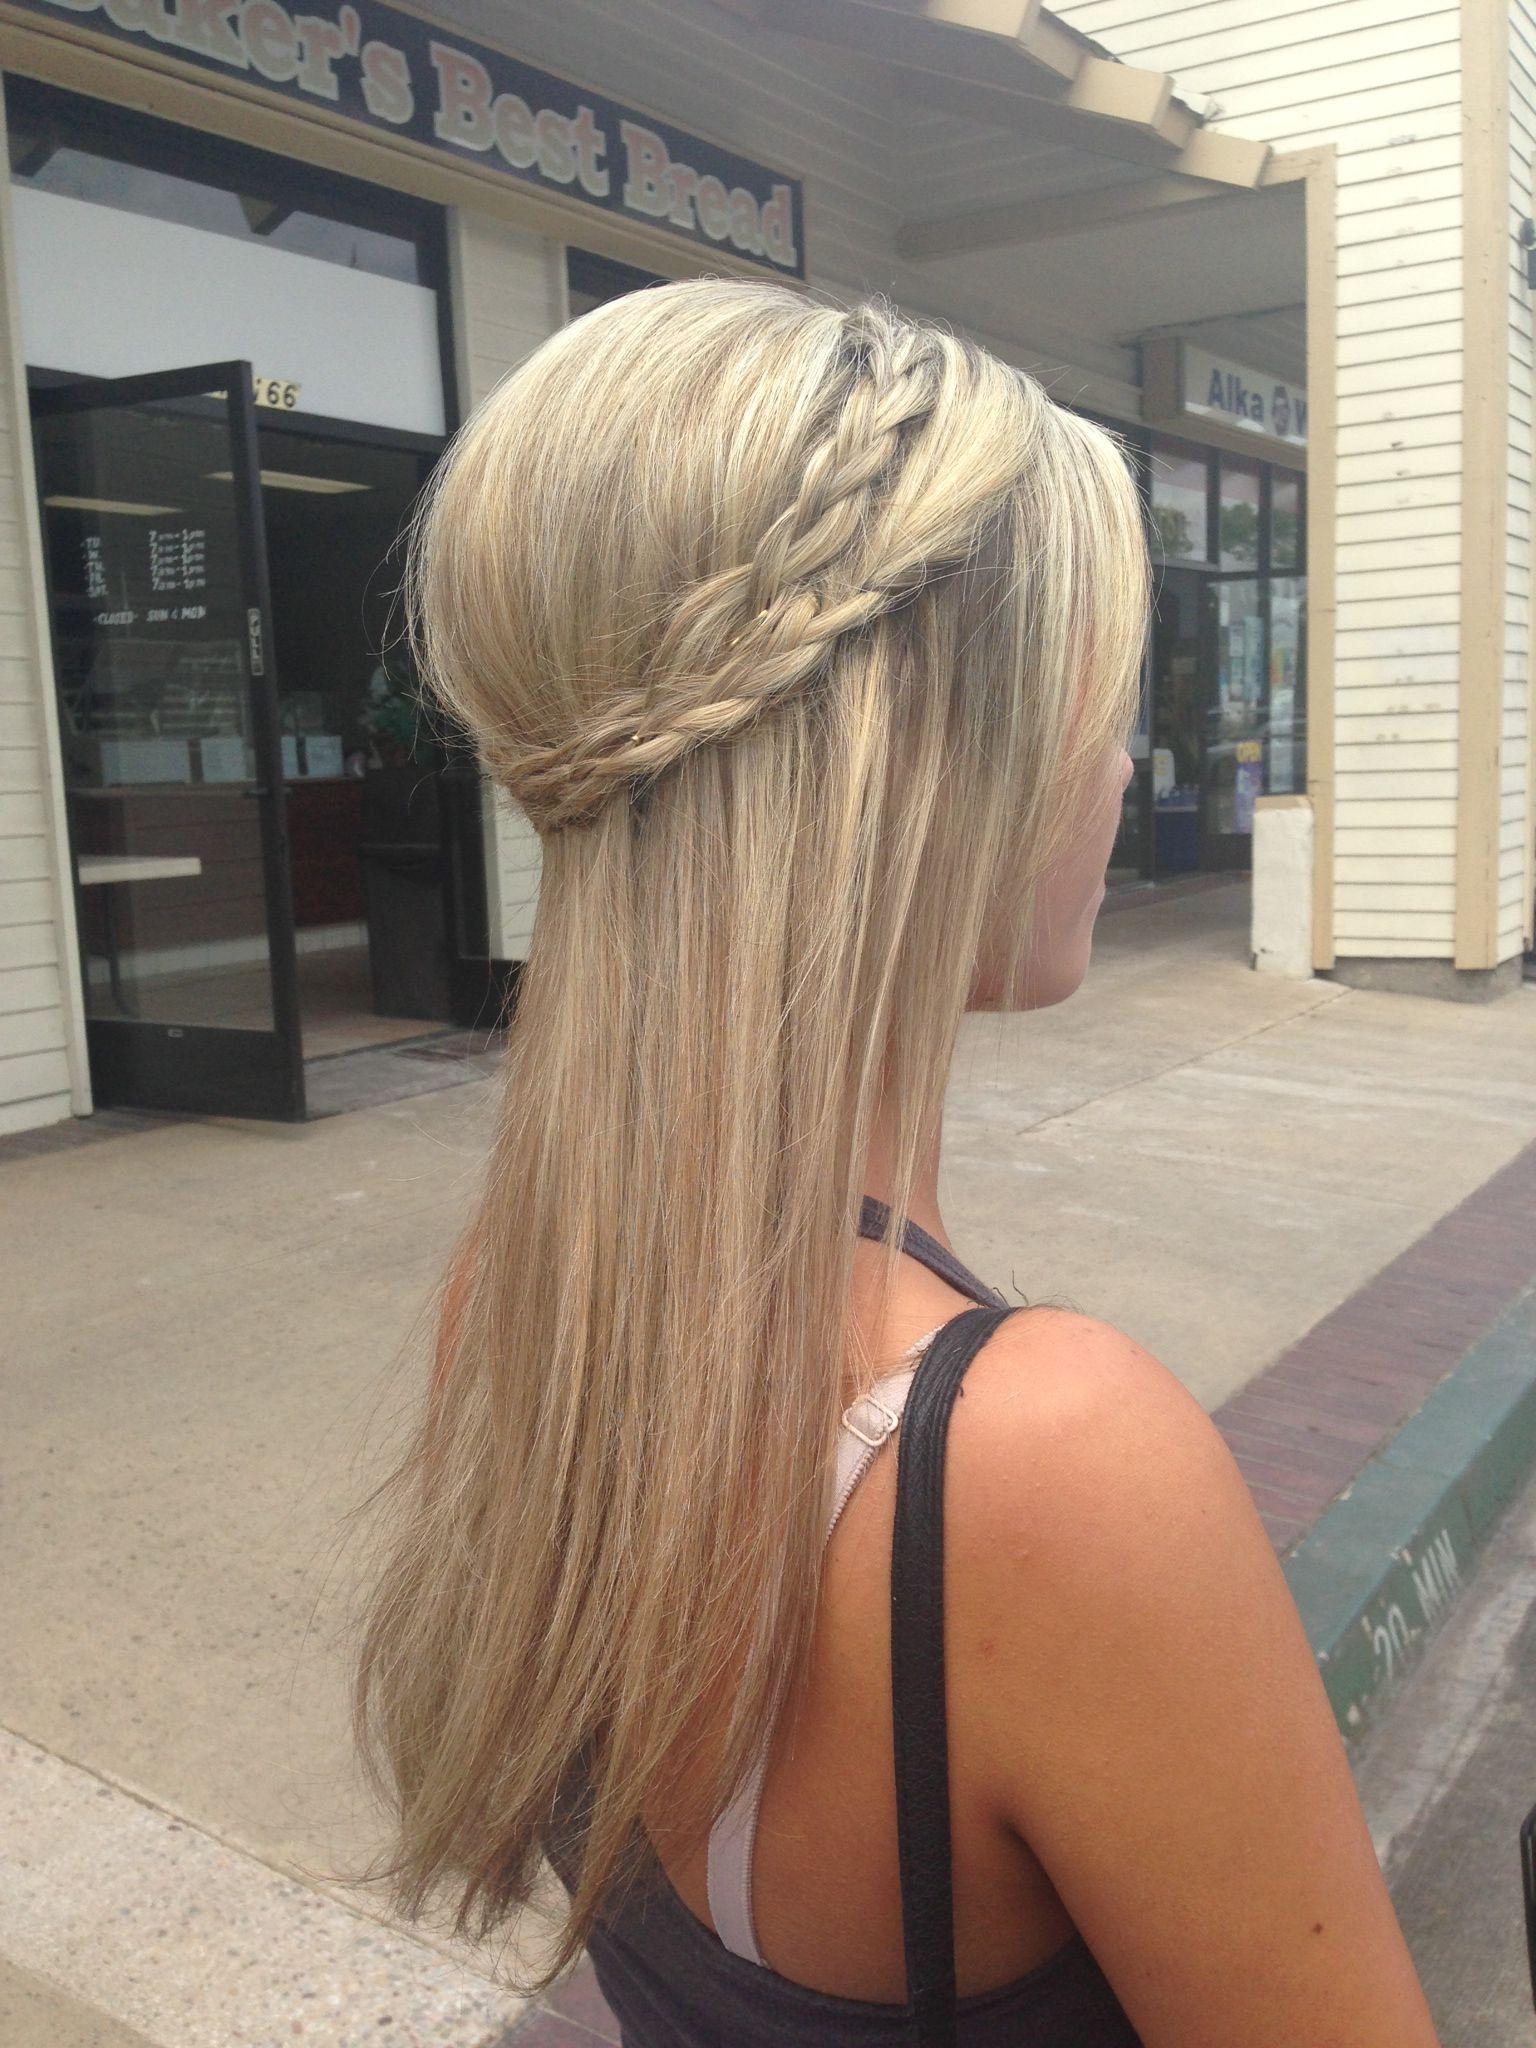 Prom Hair Half Up Braids Teased Straight Blonde Easy Formal Hairstyles Straight Hairstyles Straight Formal Hairstyles